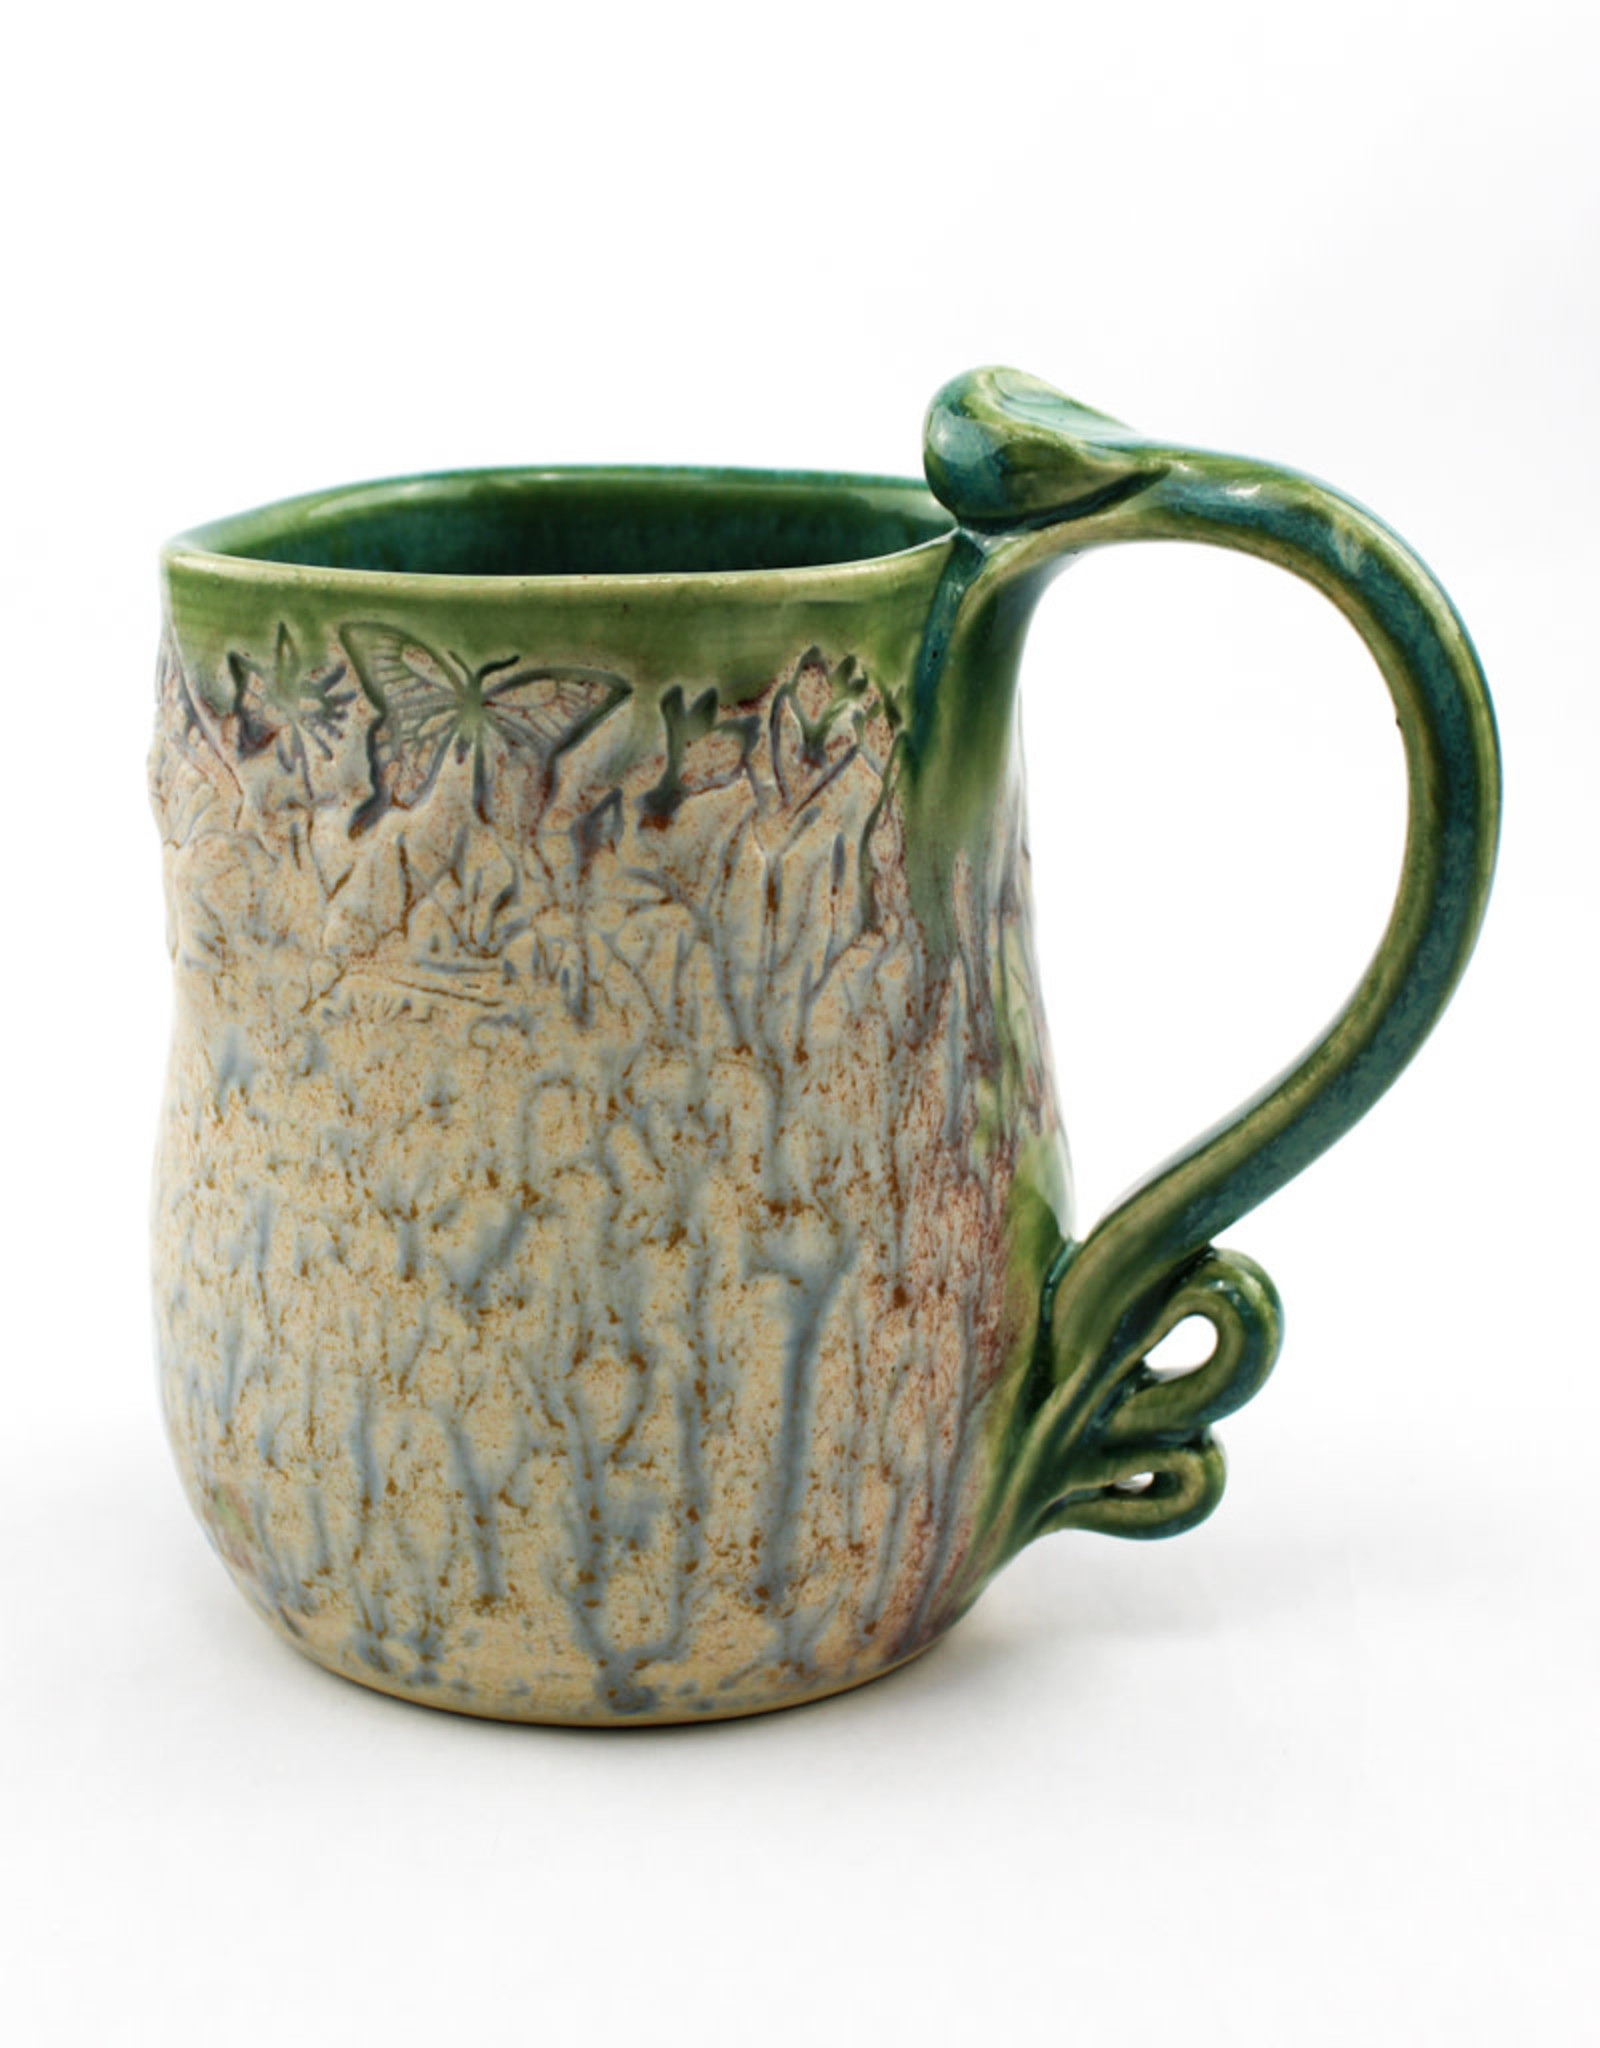 Earth Tones Pottery Pressed Rim Mug-Celadon Green